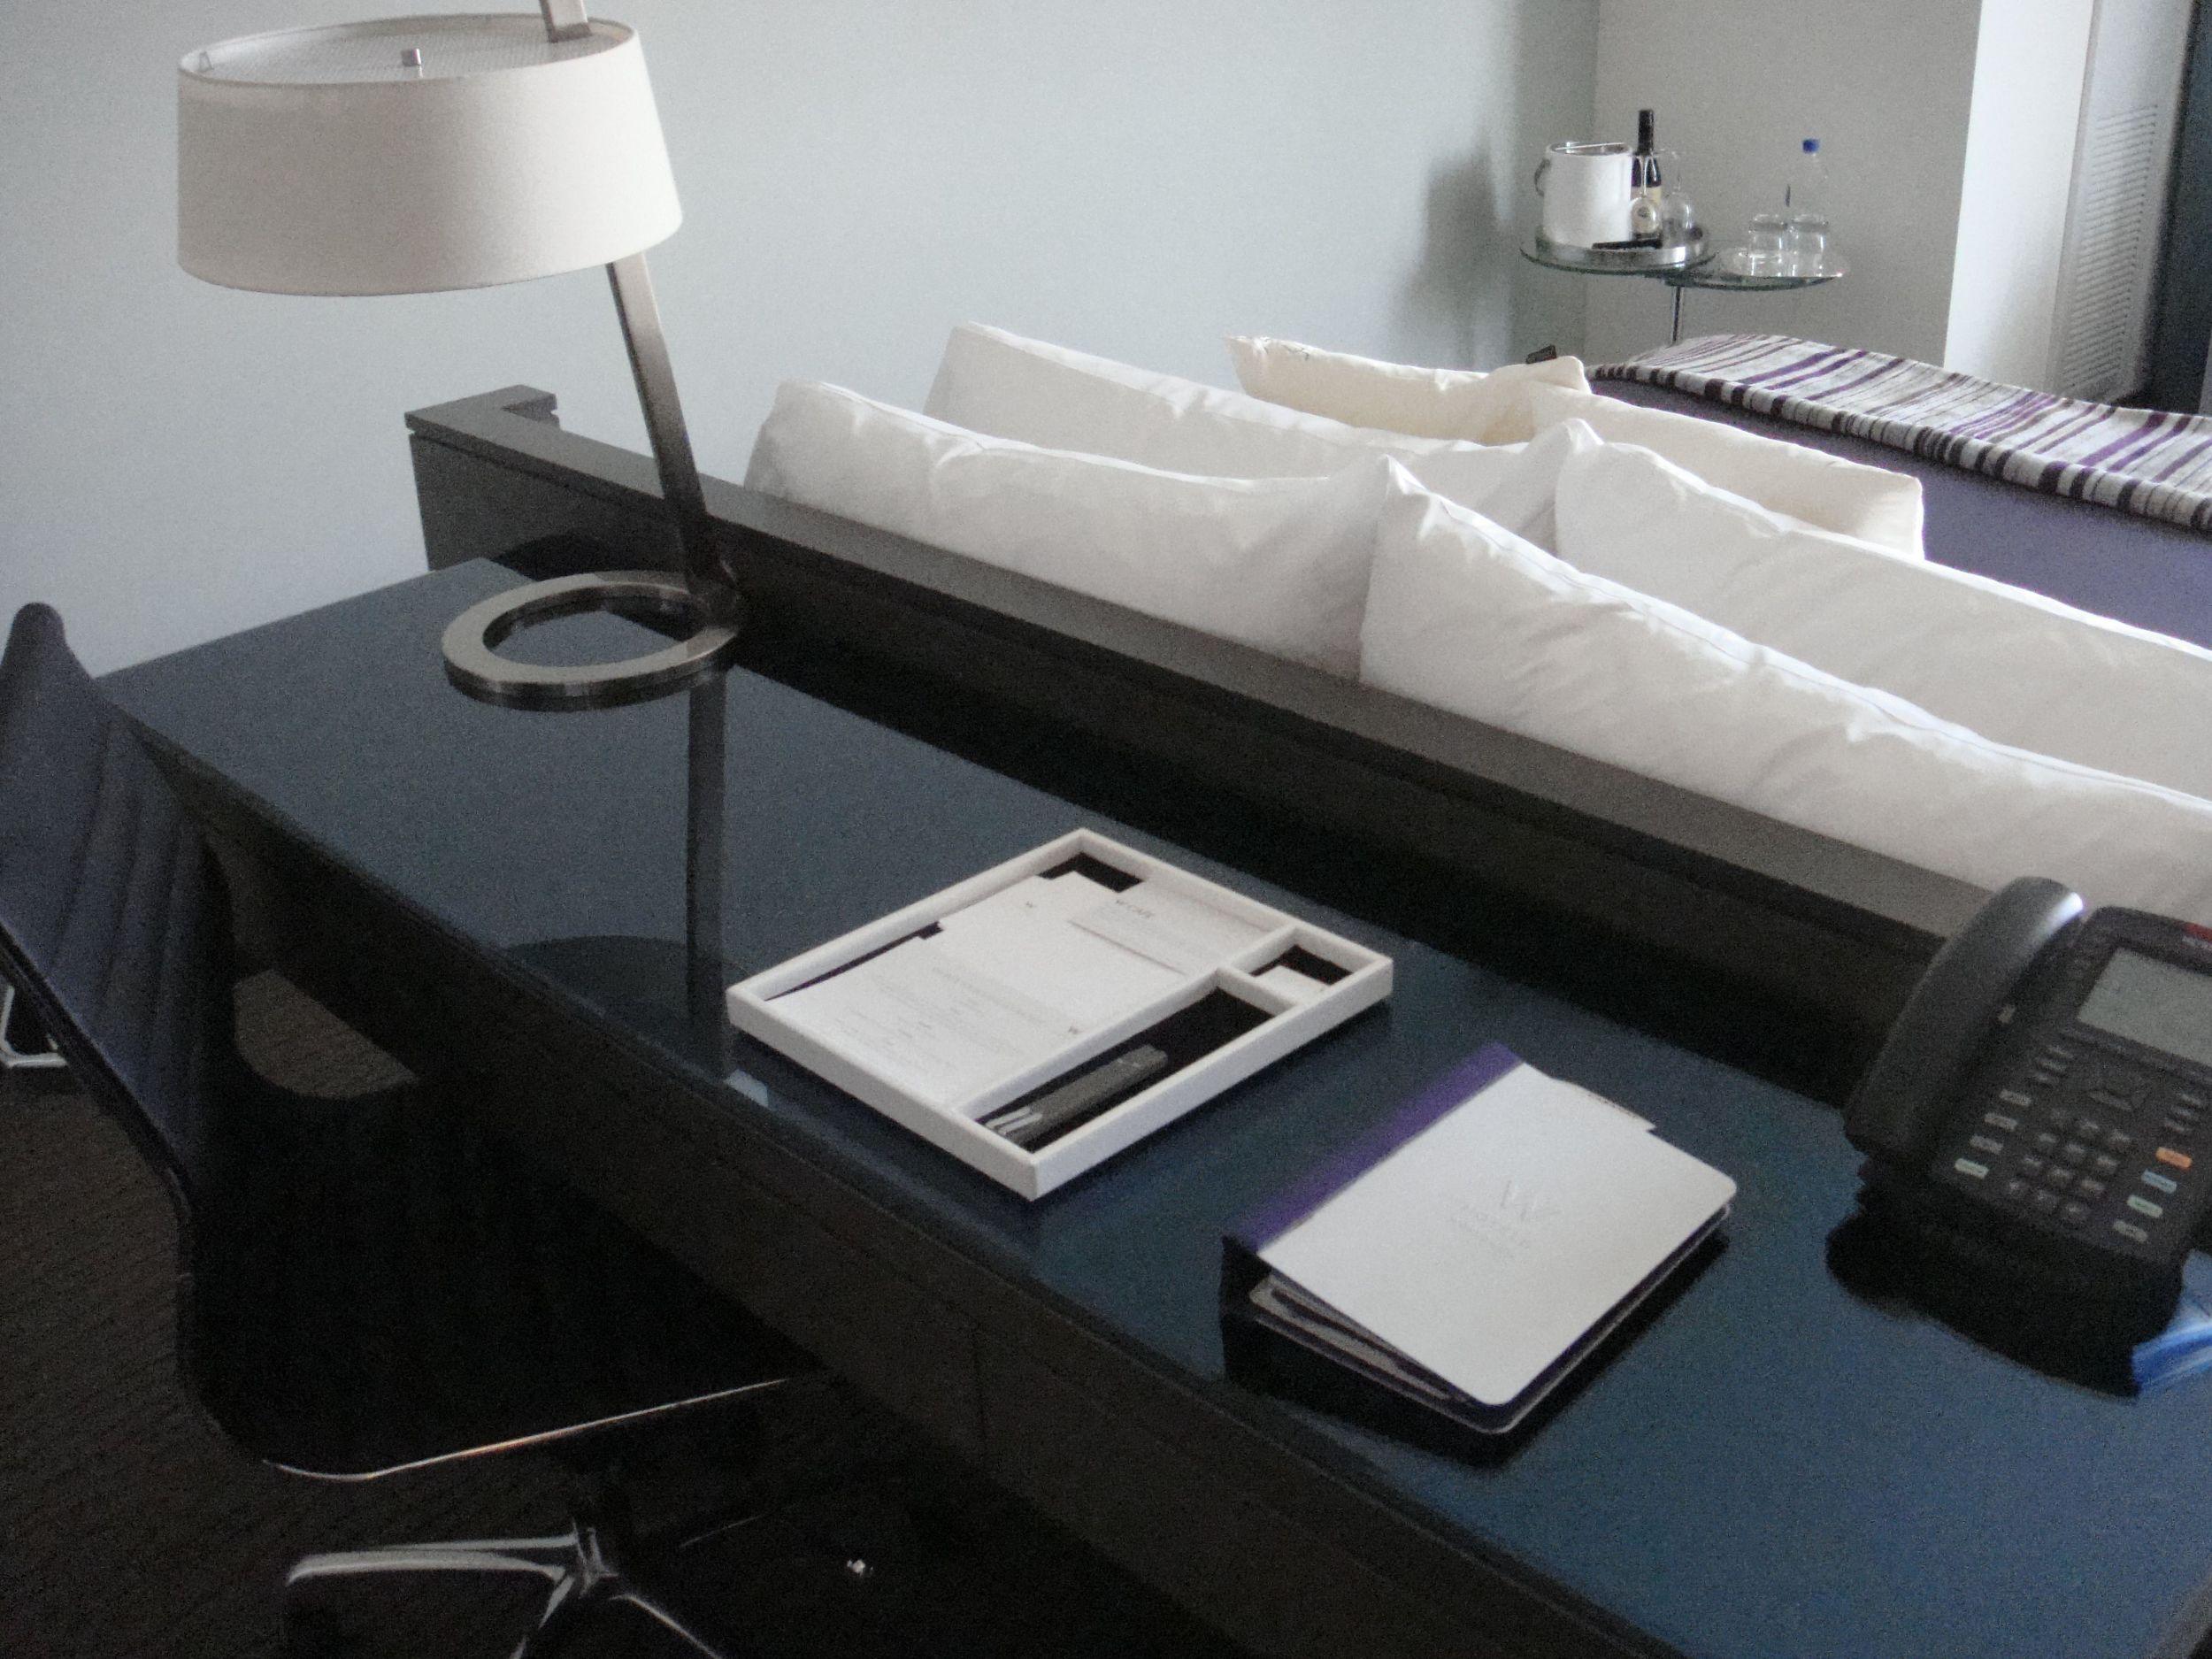 w-scottsdale - guestroom desk detail